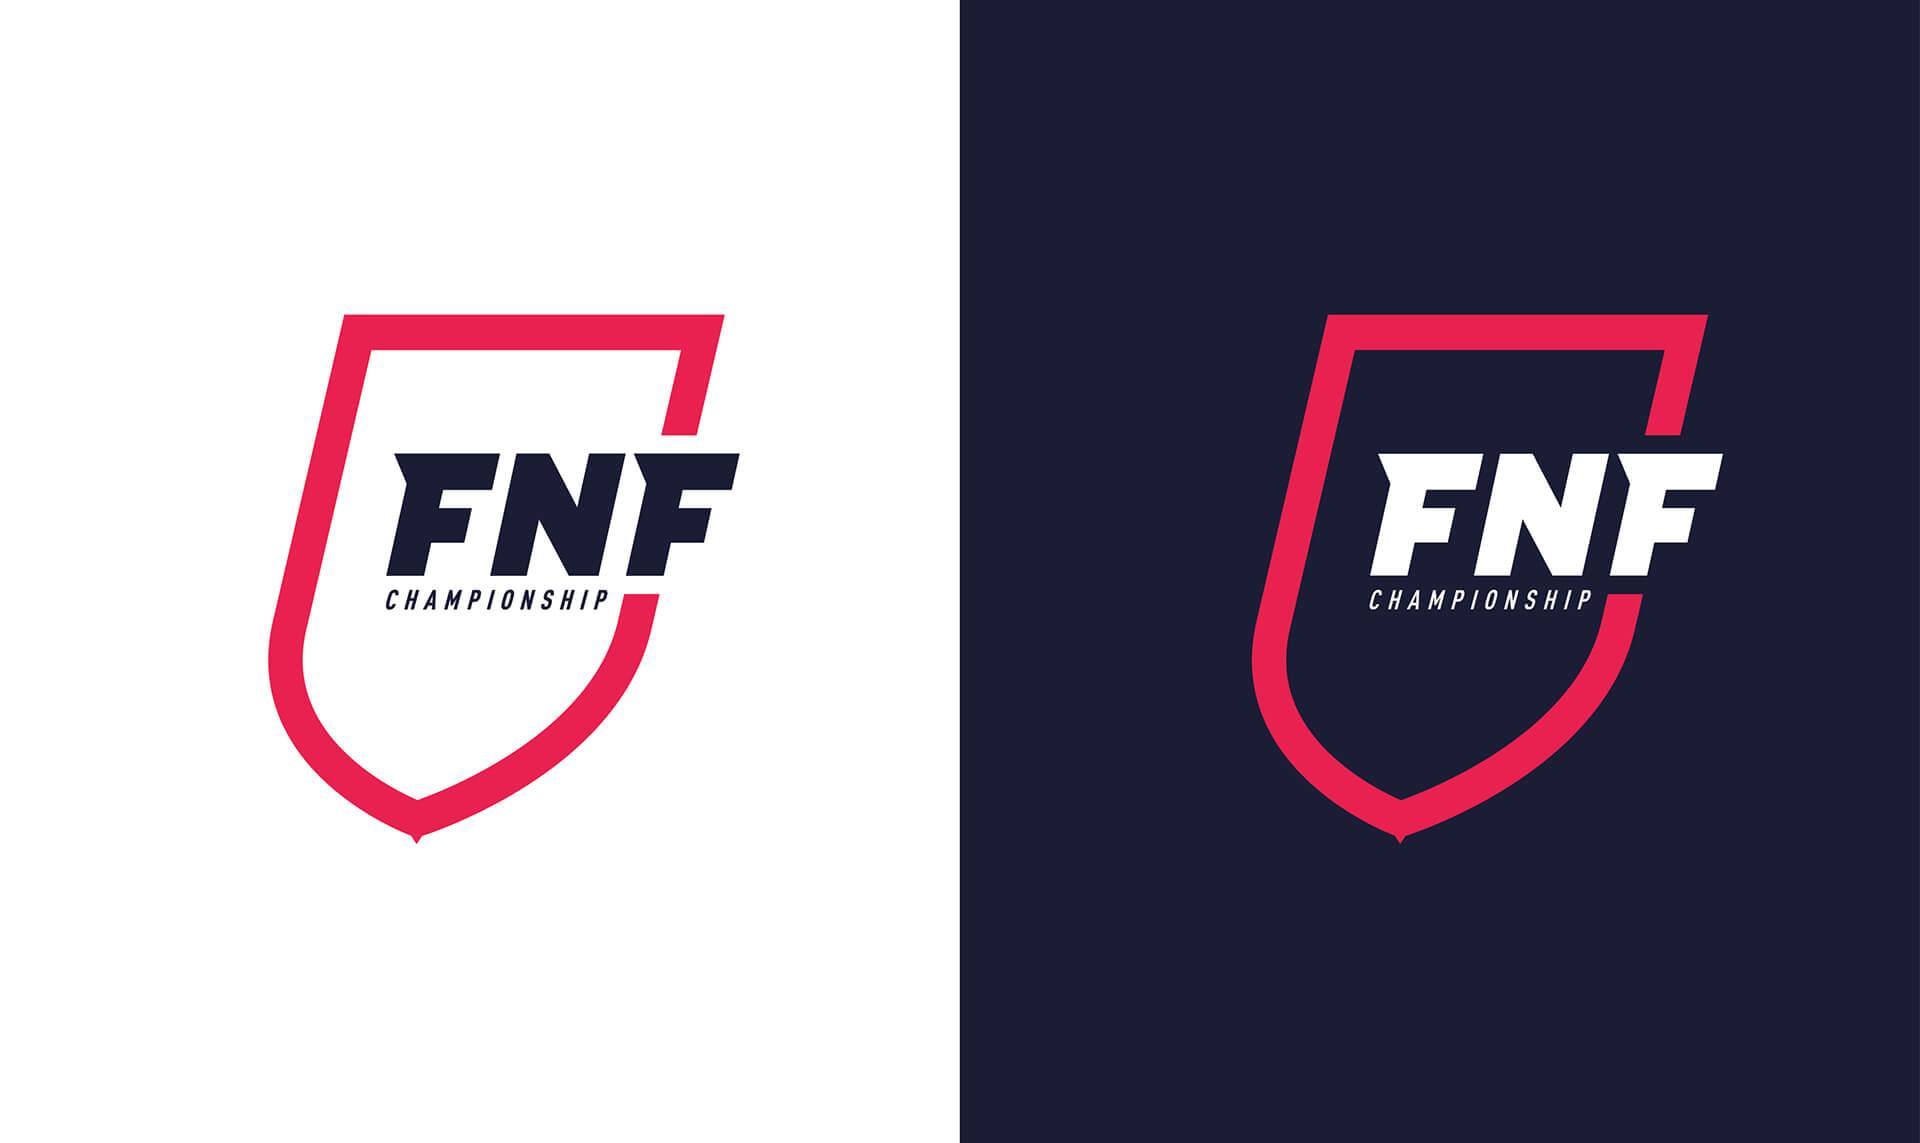 Branding-FNF-Championship-Nacione-10